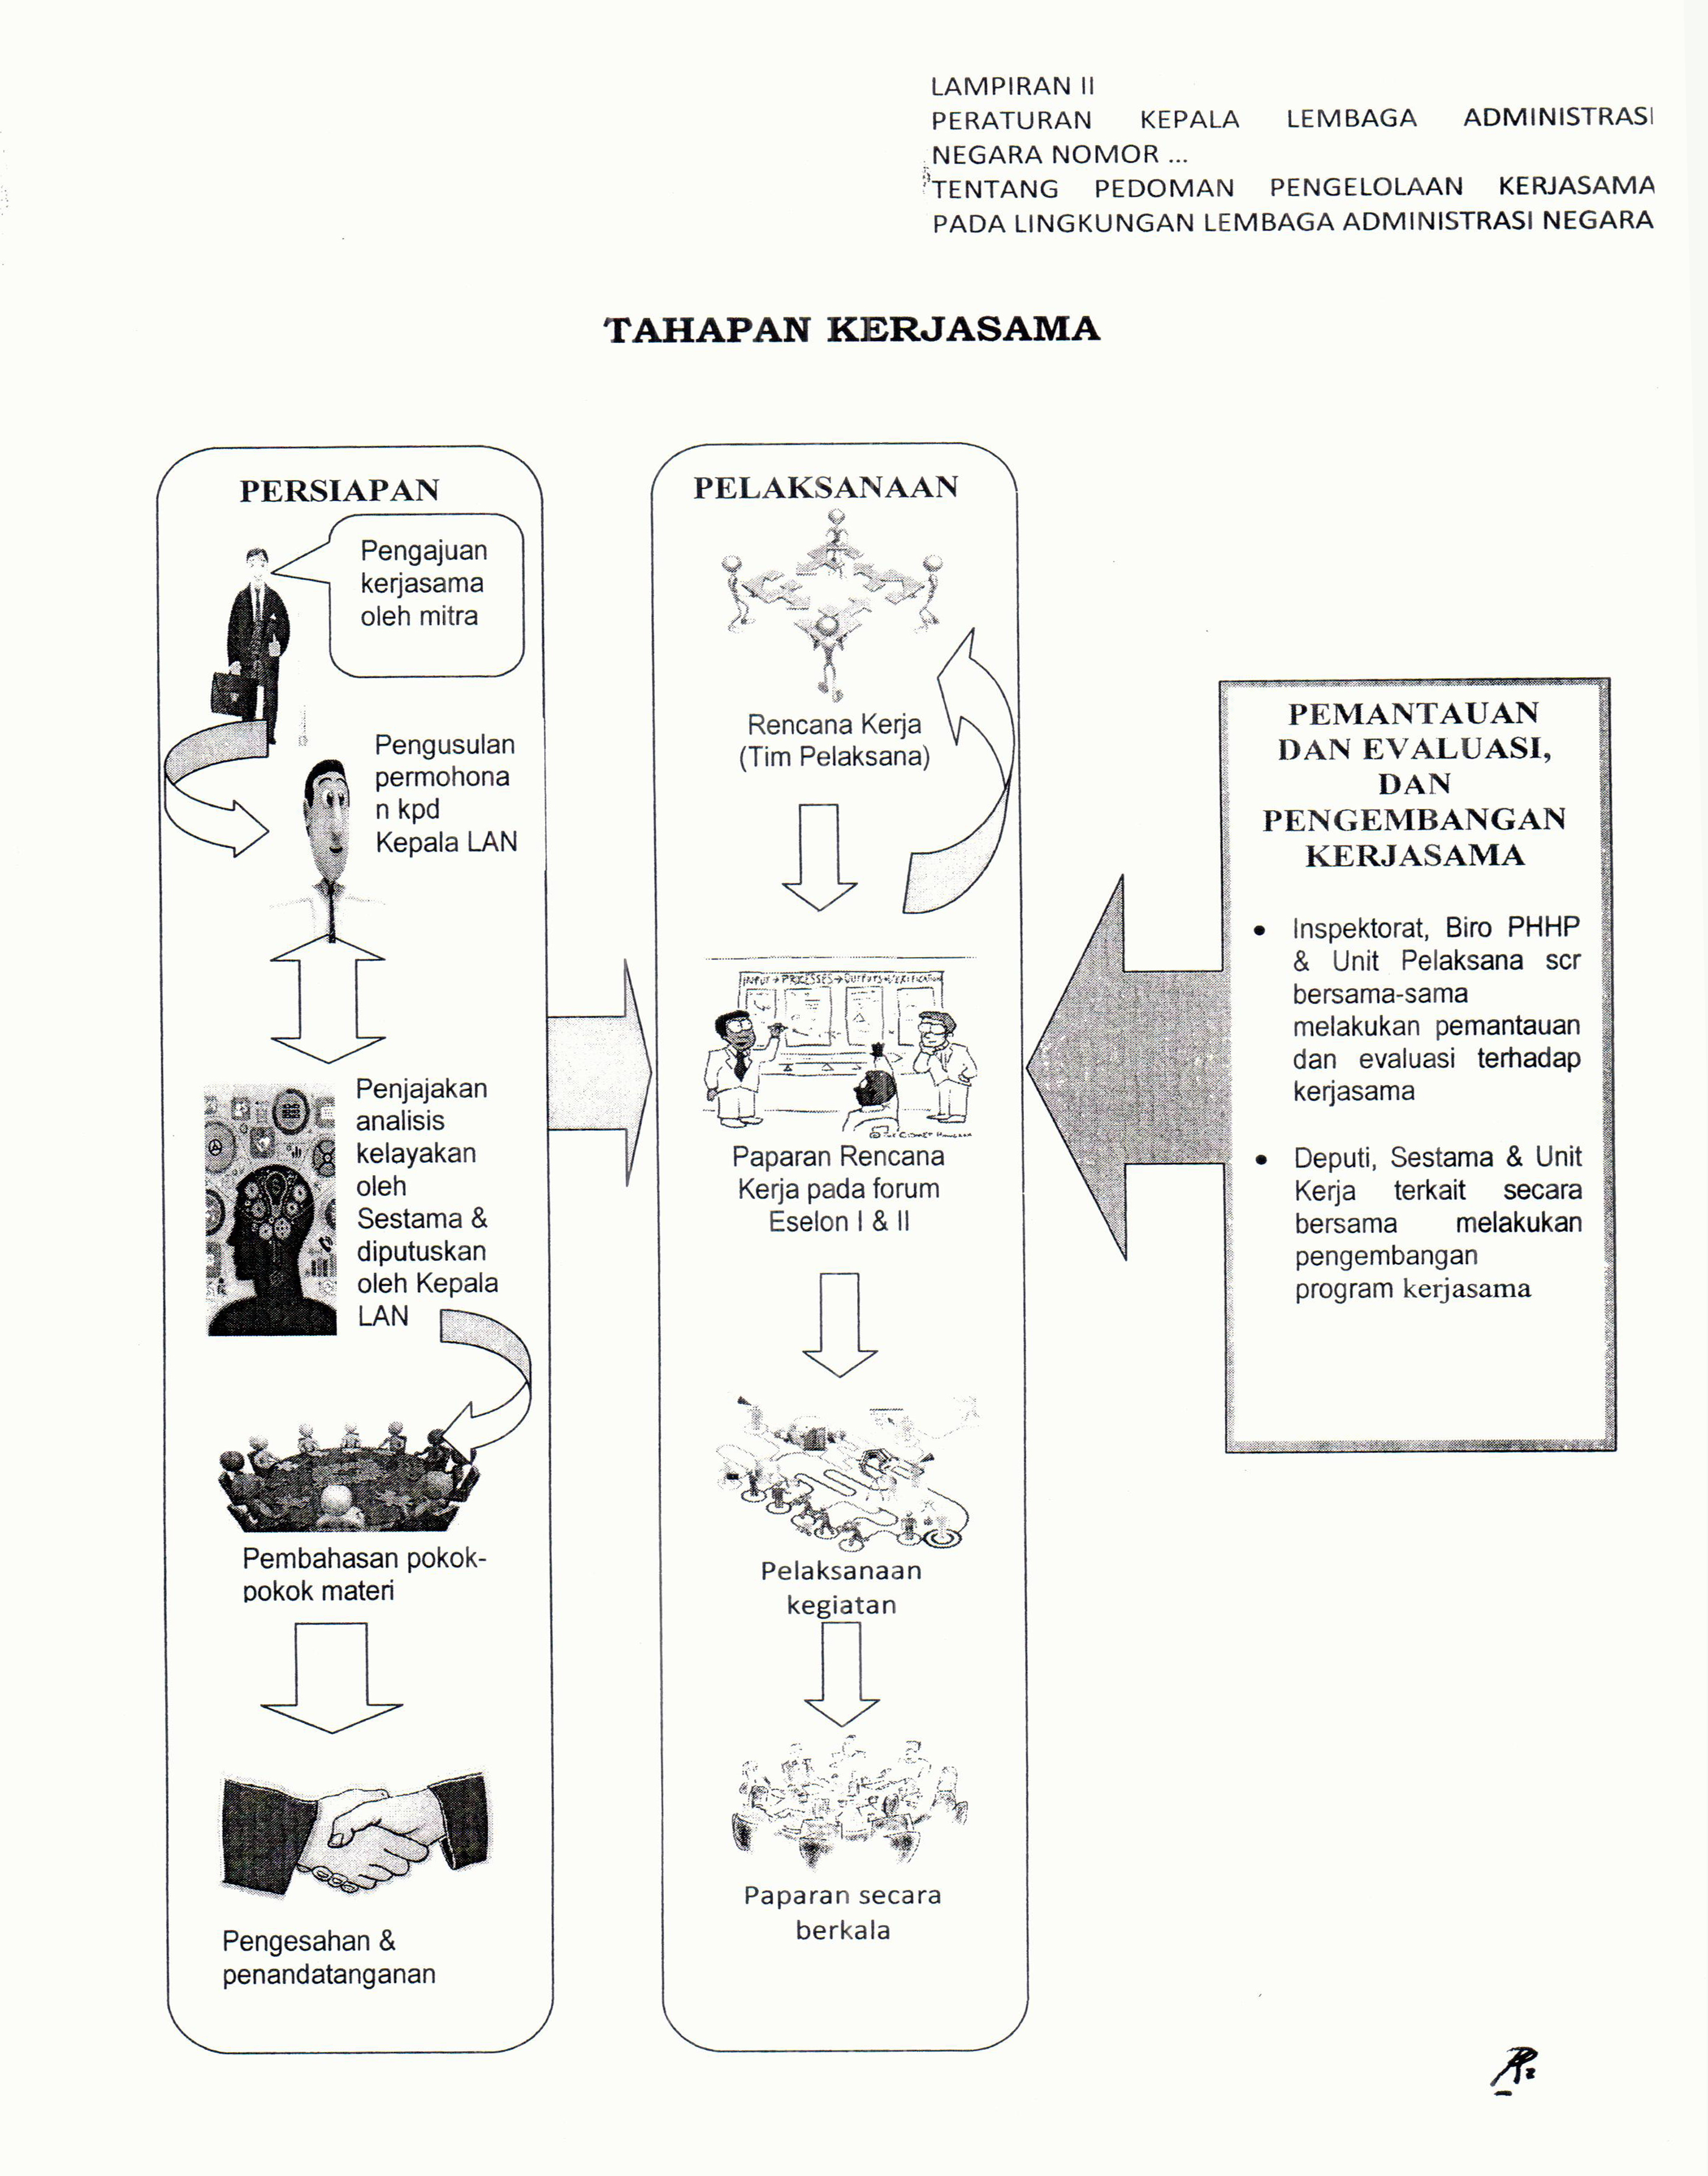 http://makarti.lan.go.id/documents/10194/504379/Tahapan+Kerjasama+di+Lingkungan+LAN.jpg/f72e4fac-7427-4ef5-998b-4c6198ff71a9?t=1426496857866